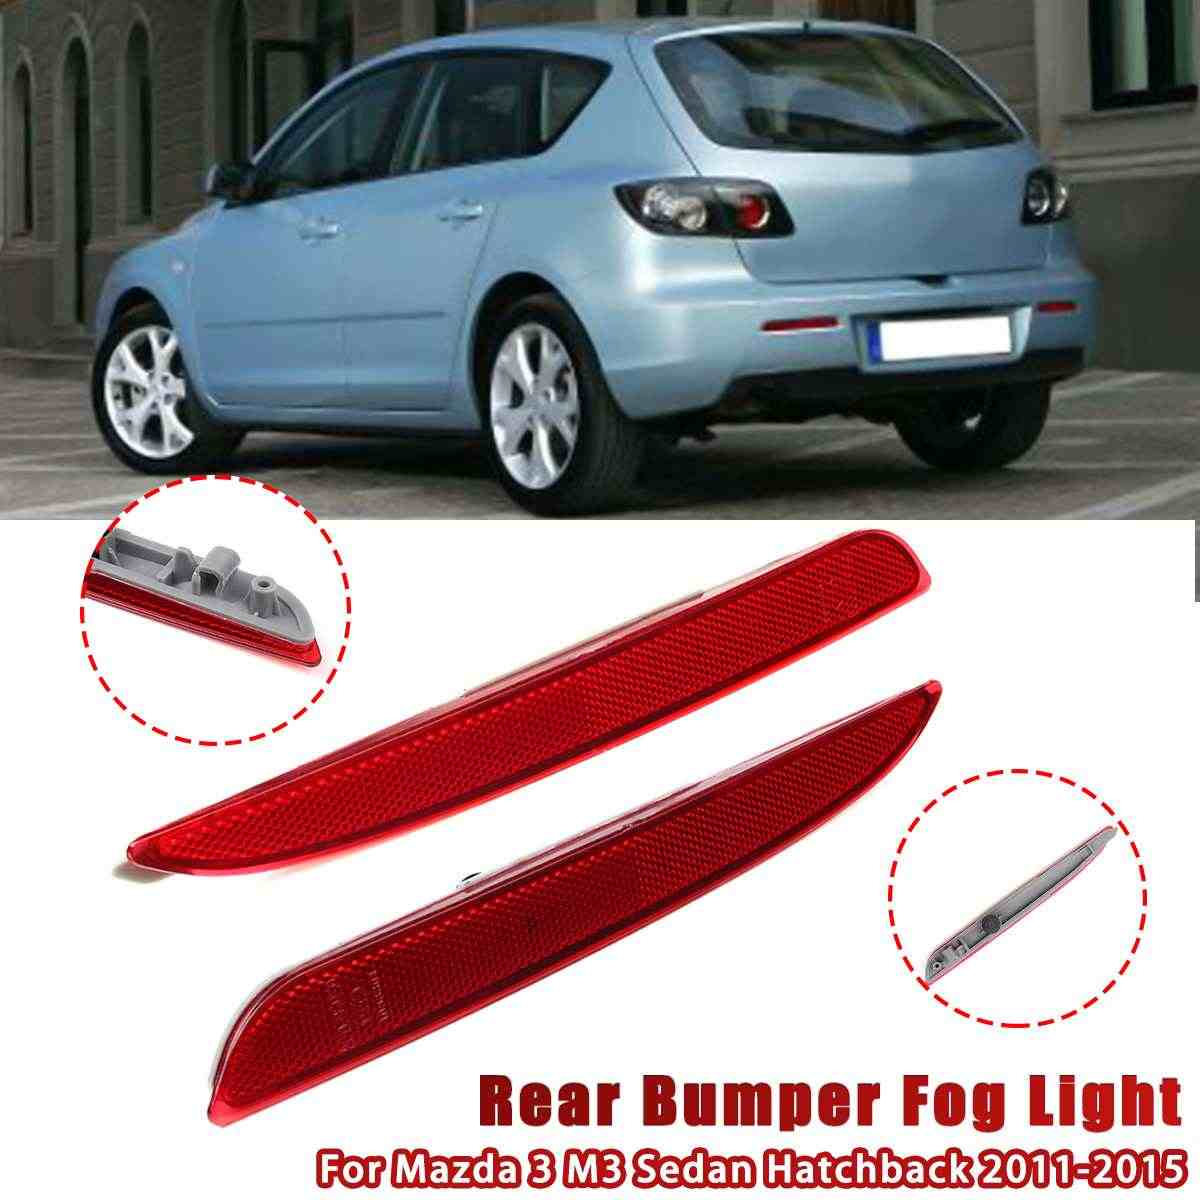 Window Regulator for Mazda 3 04-09 Rear LH Power w//Motor Hatcback//Sedan Left Side